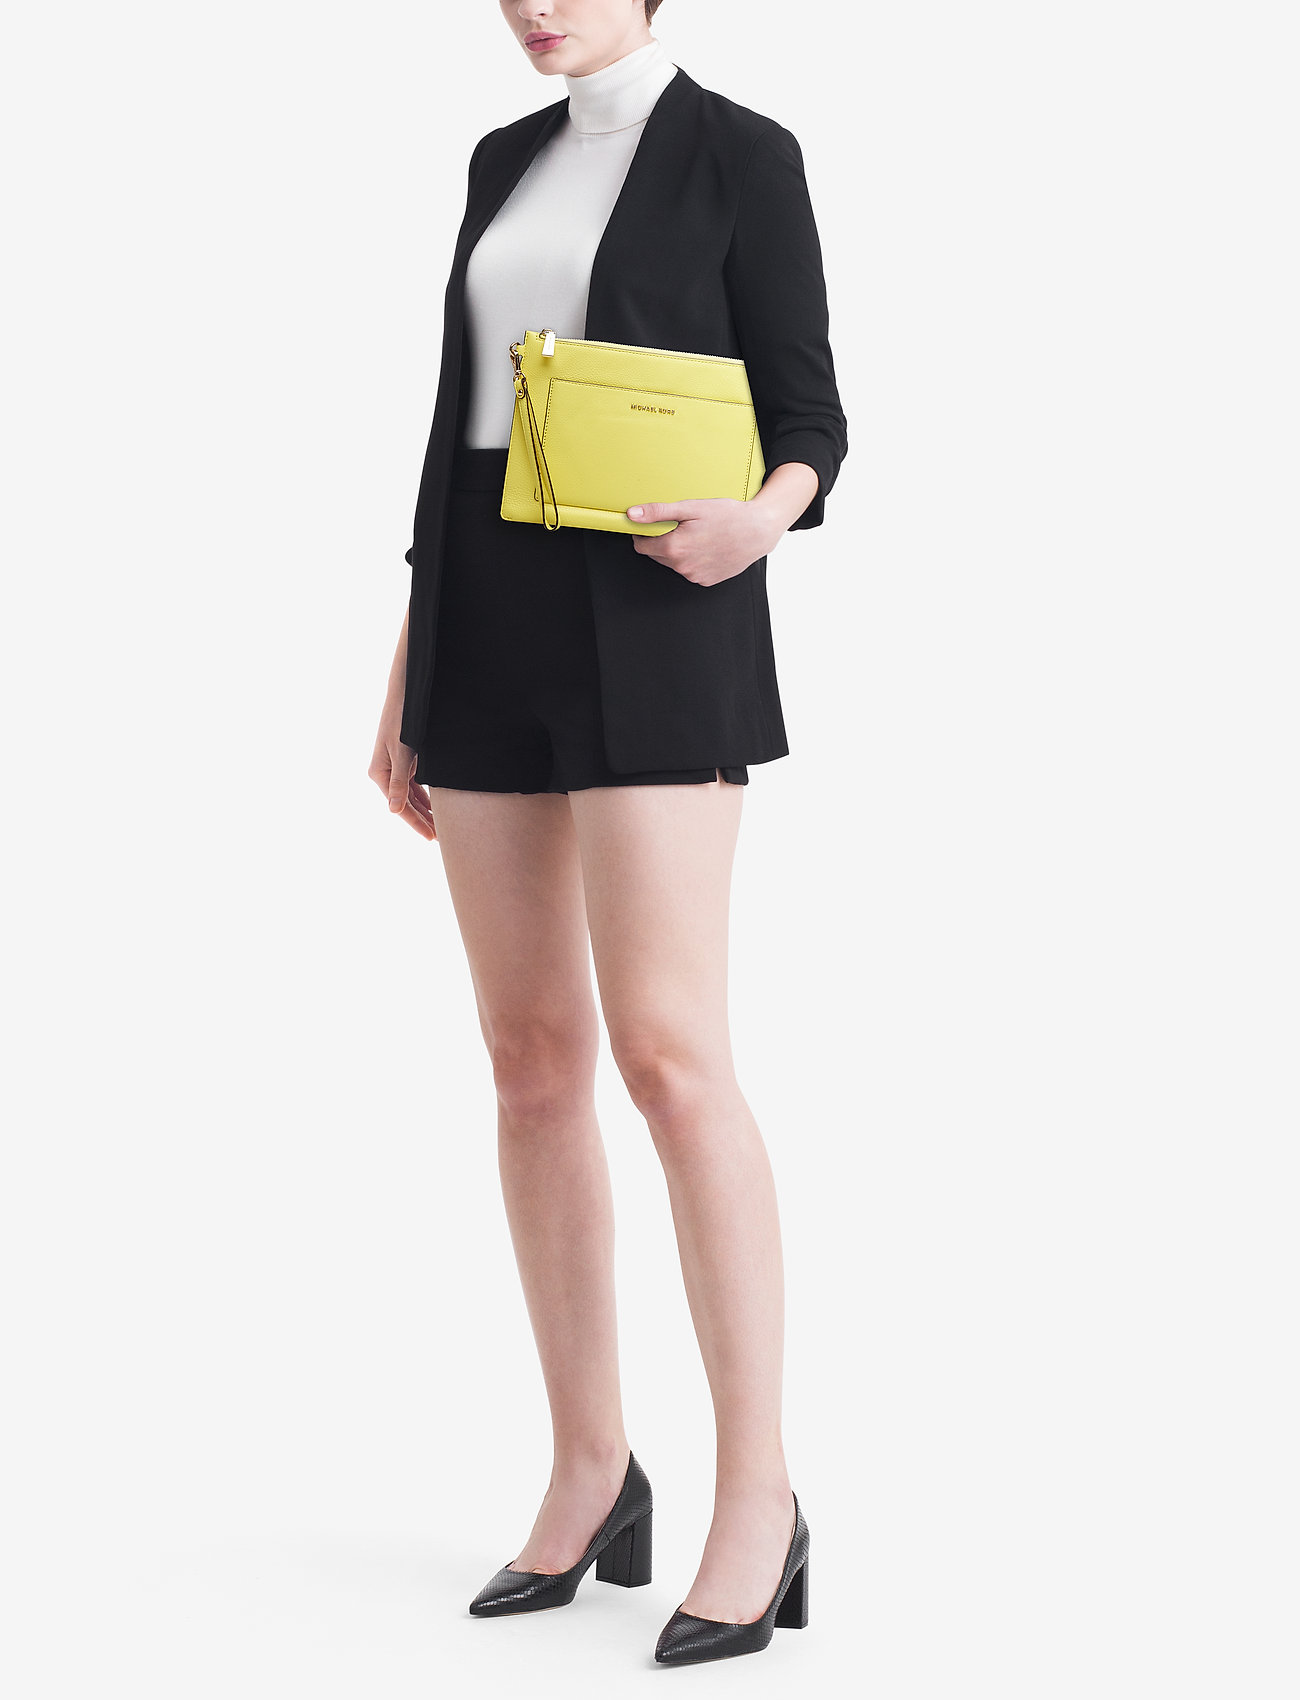 Michael Kors Bags POUCHES & CLUTCHES LG POCKET ZIP POUCH